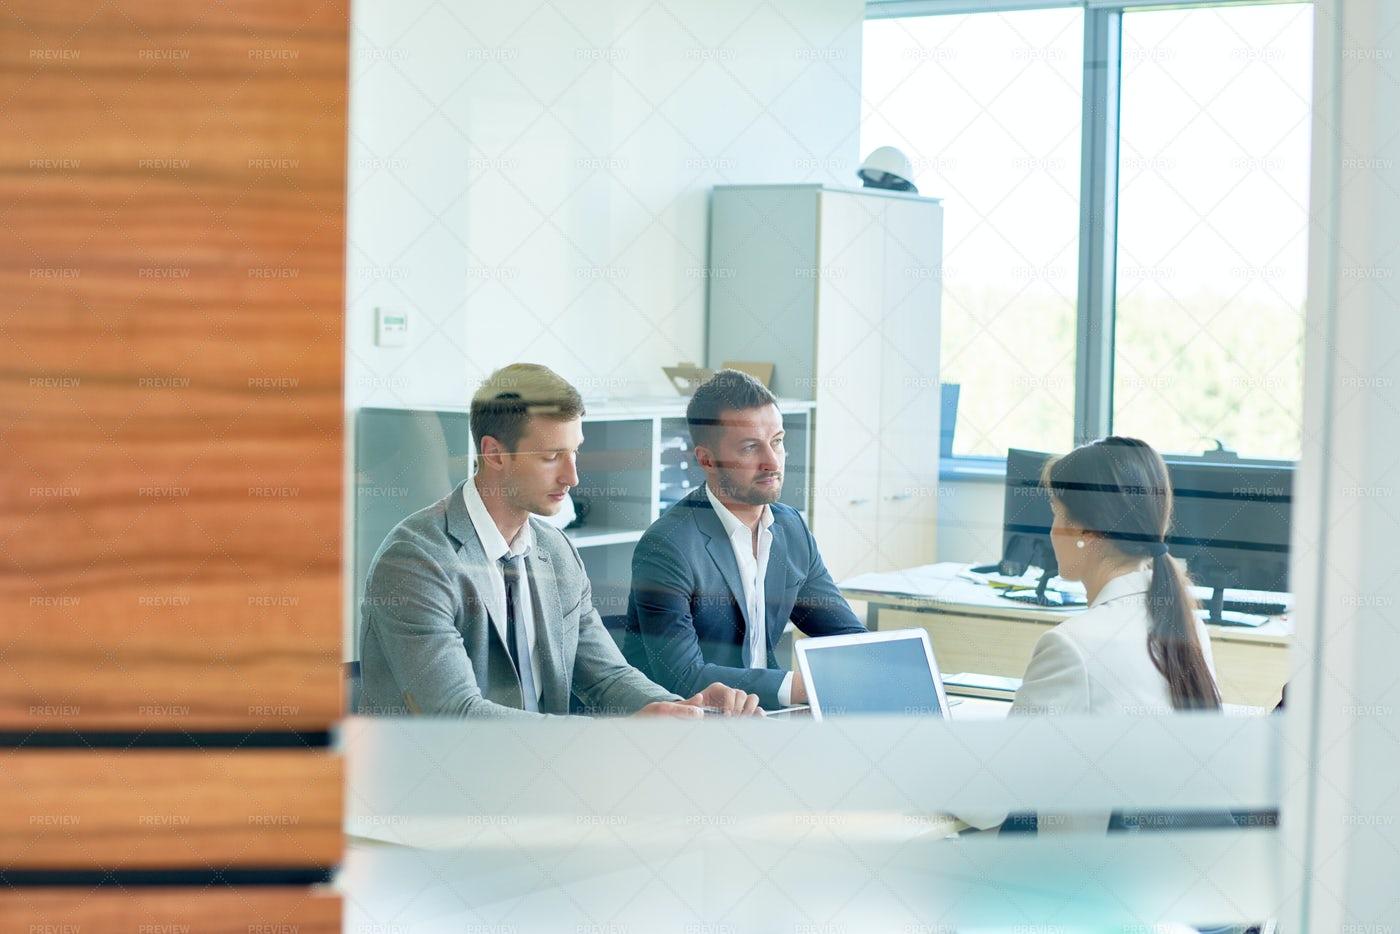 Business Meeting, Copy Space: Stock Photos